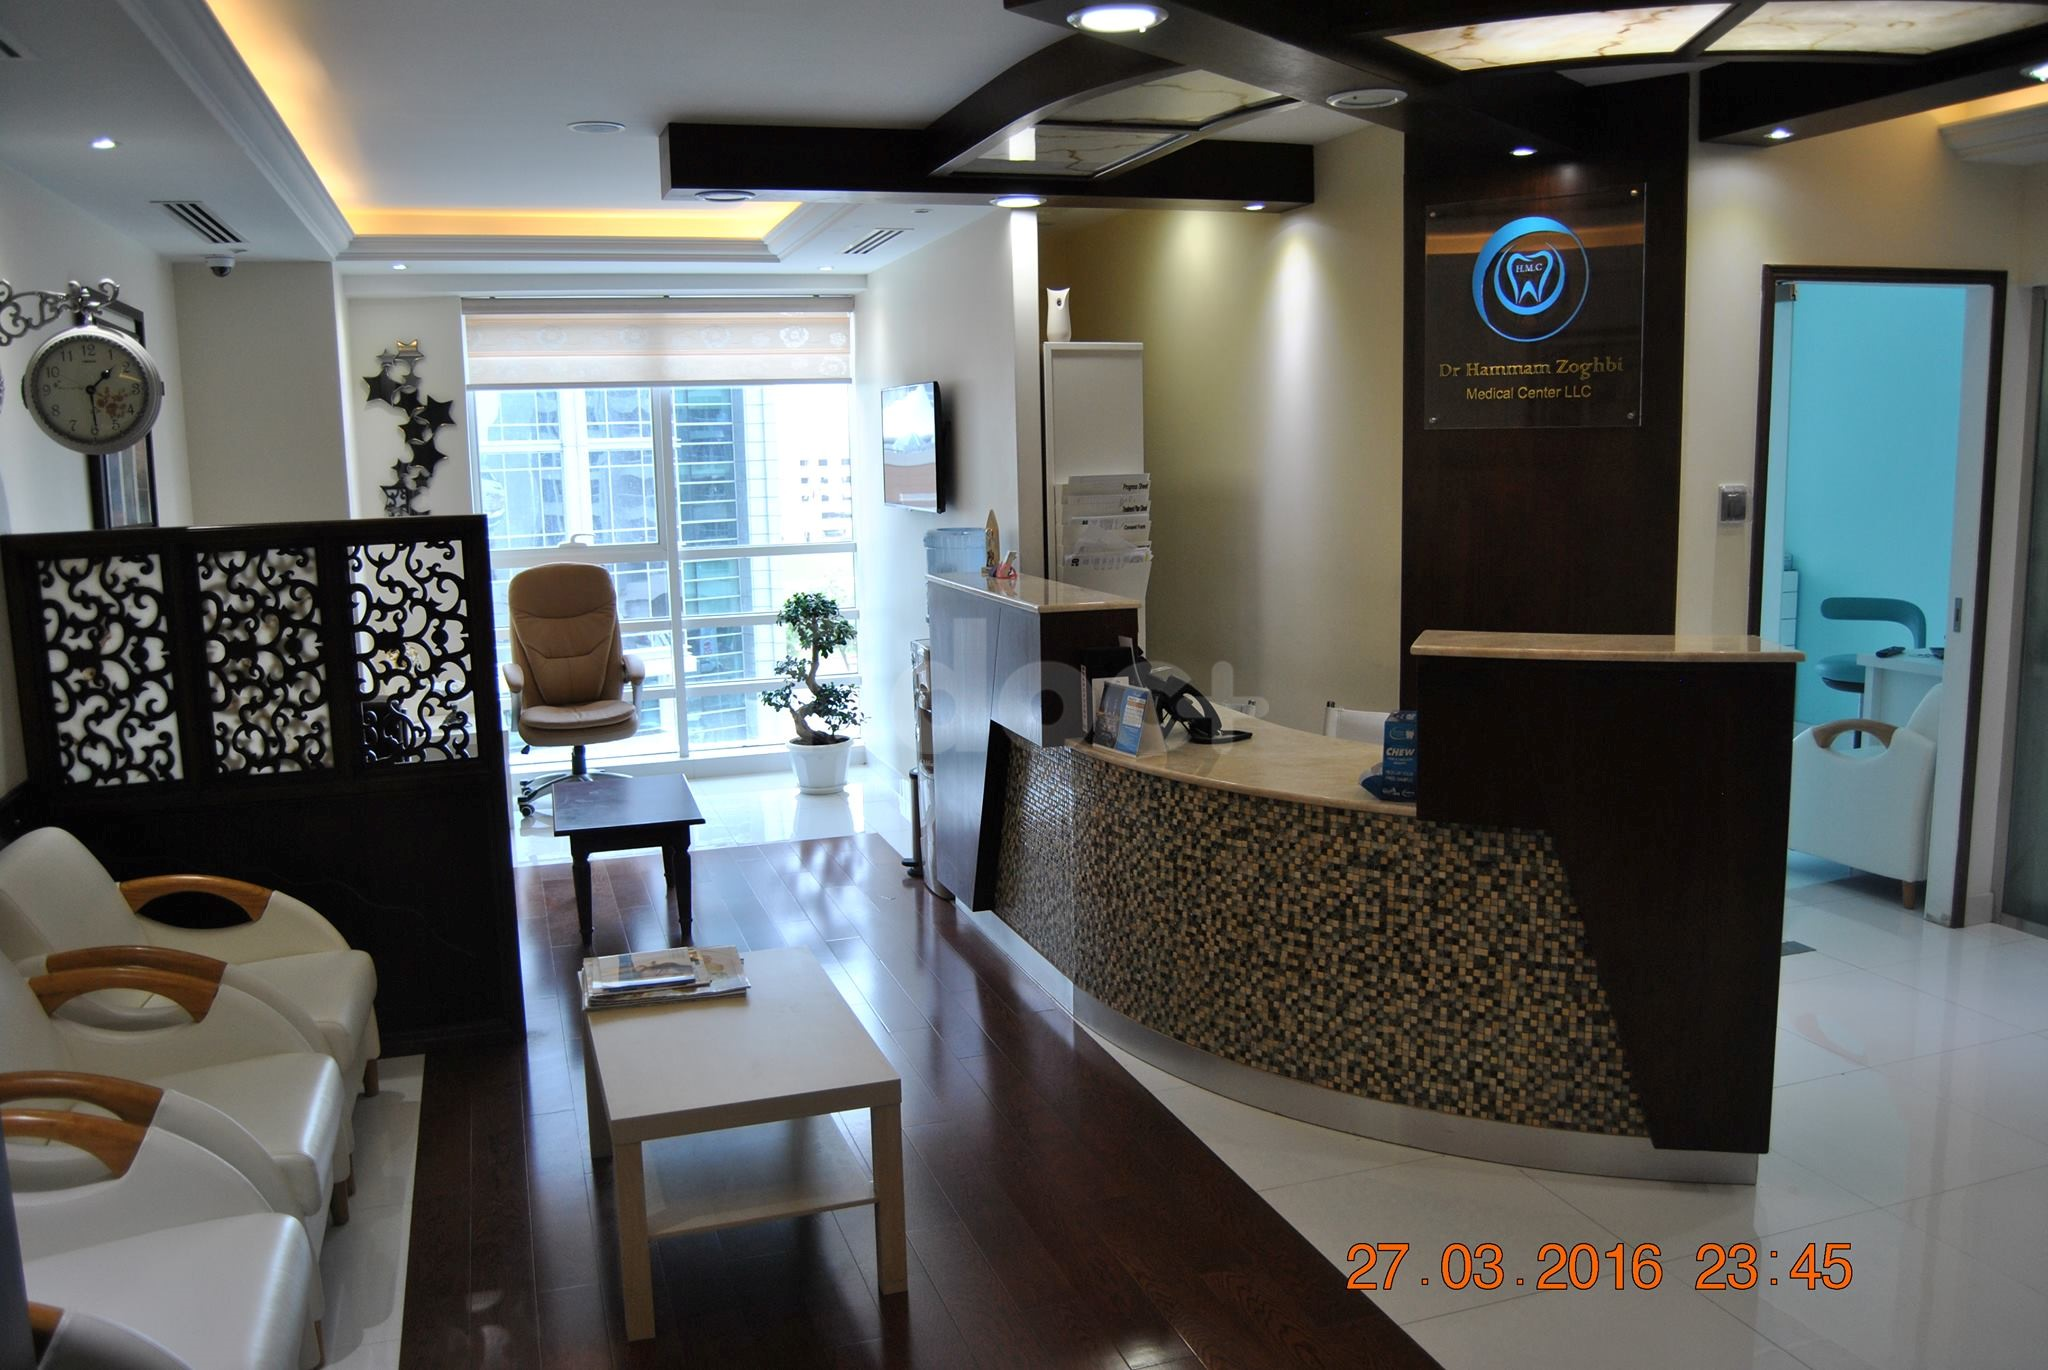 Dr. Hammam Zoghbi Medical Center, Dubai